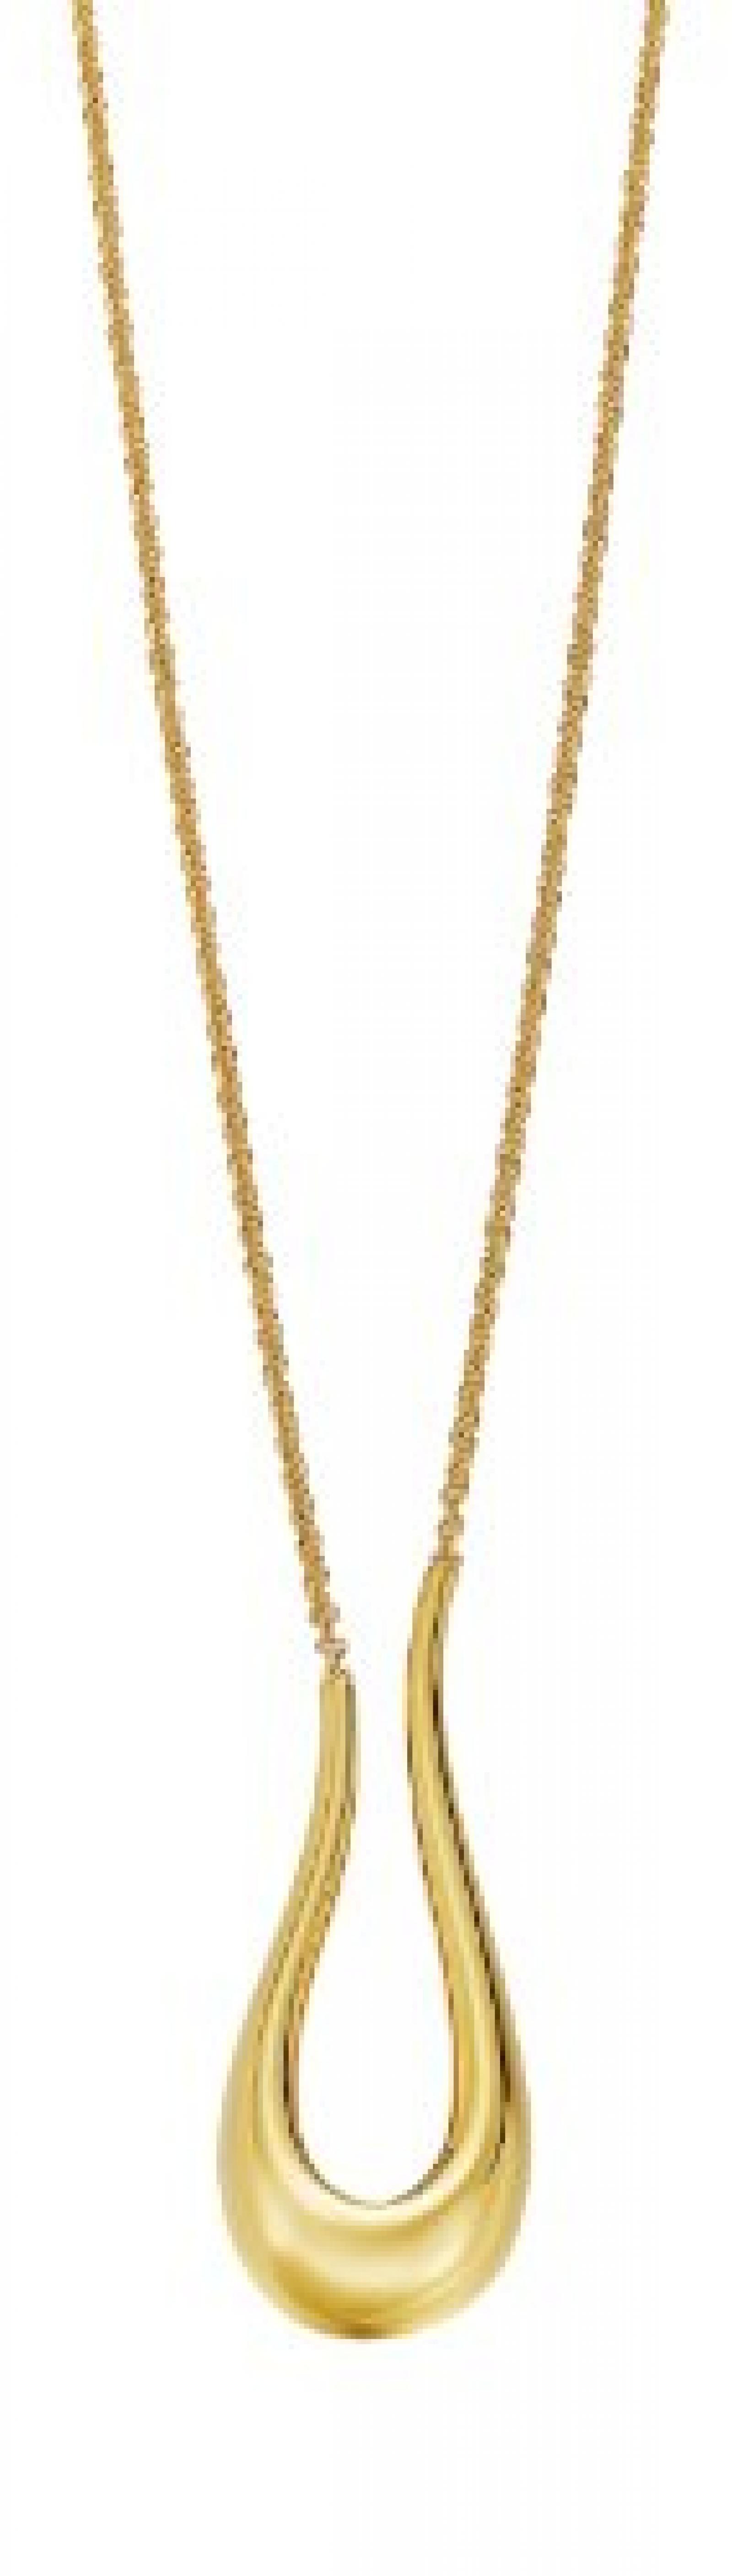 Joop Damen-Halsband 925 Sterling Silber rhodiniert Ohne Drew JPNL90561B800